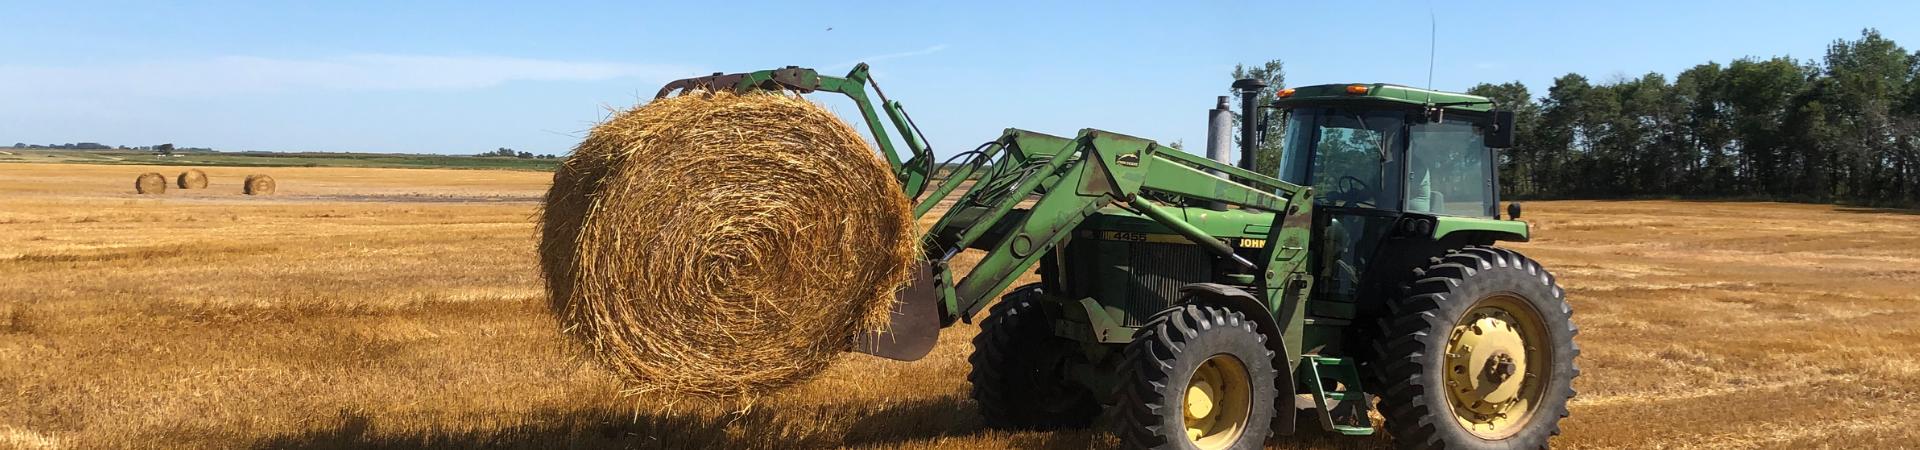 hay field farm